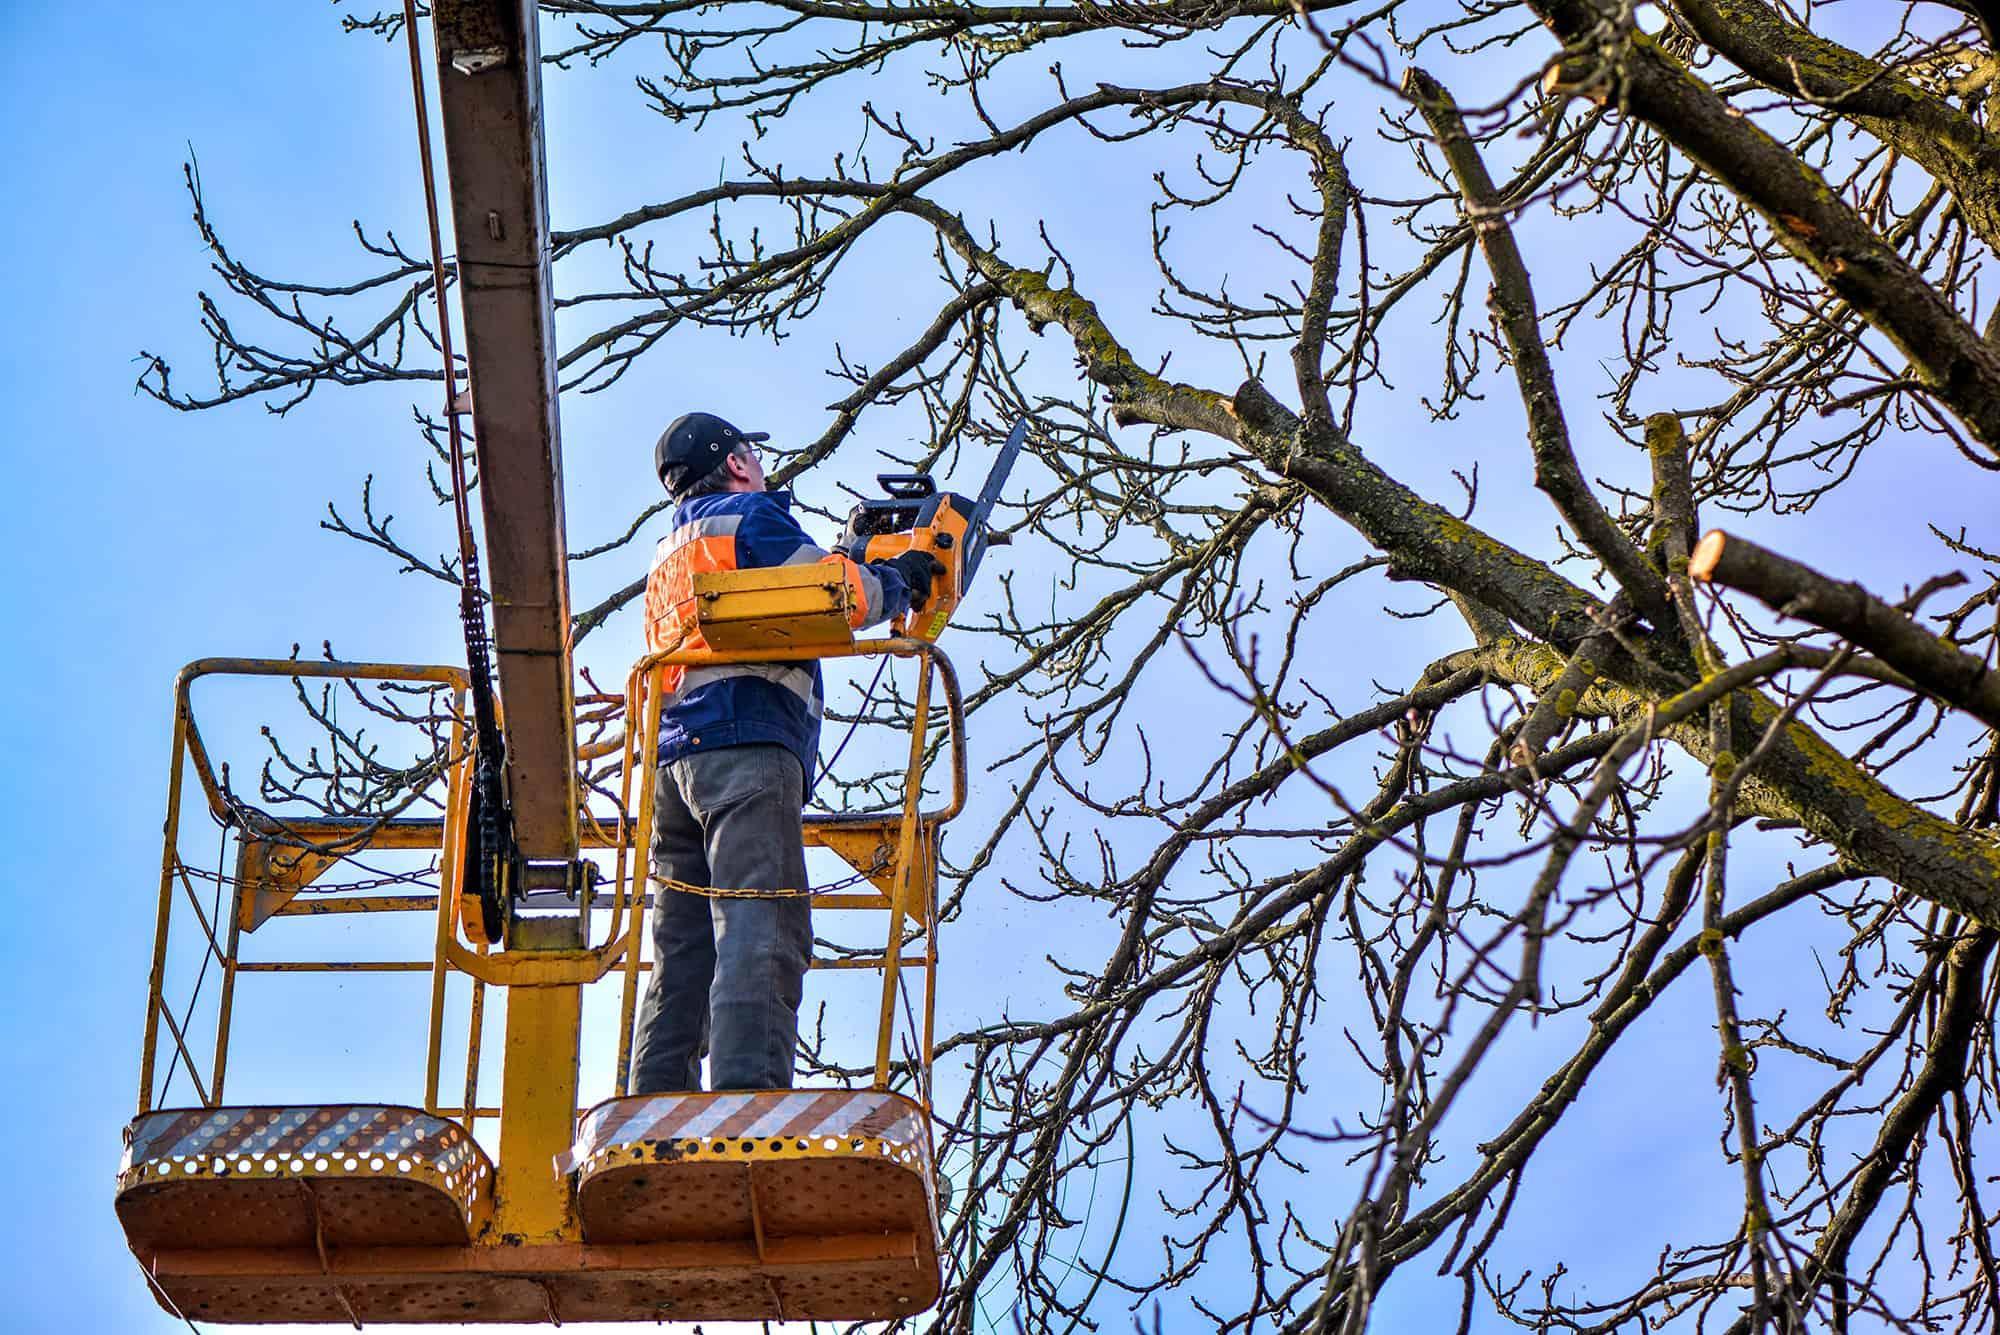 man cutting branches